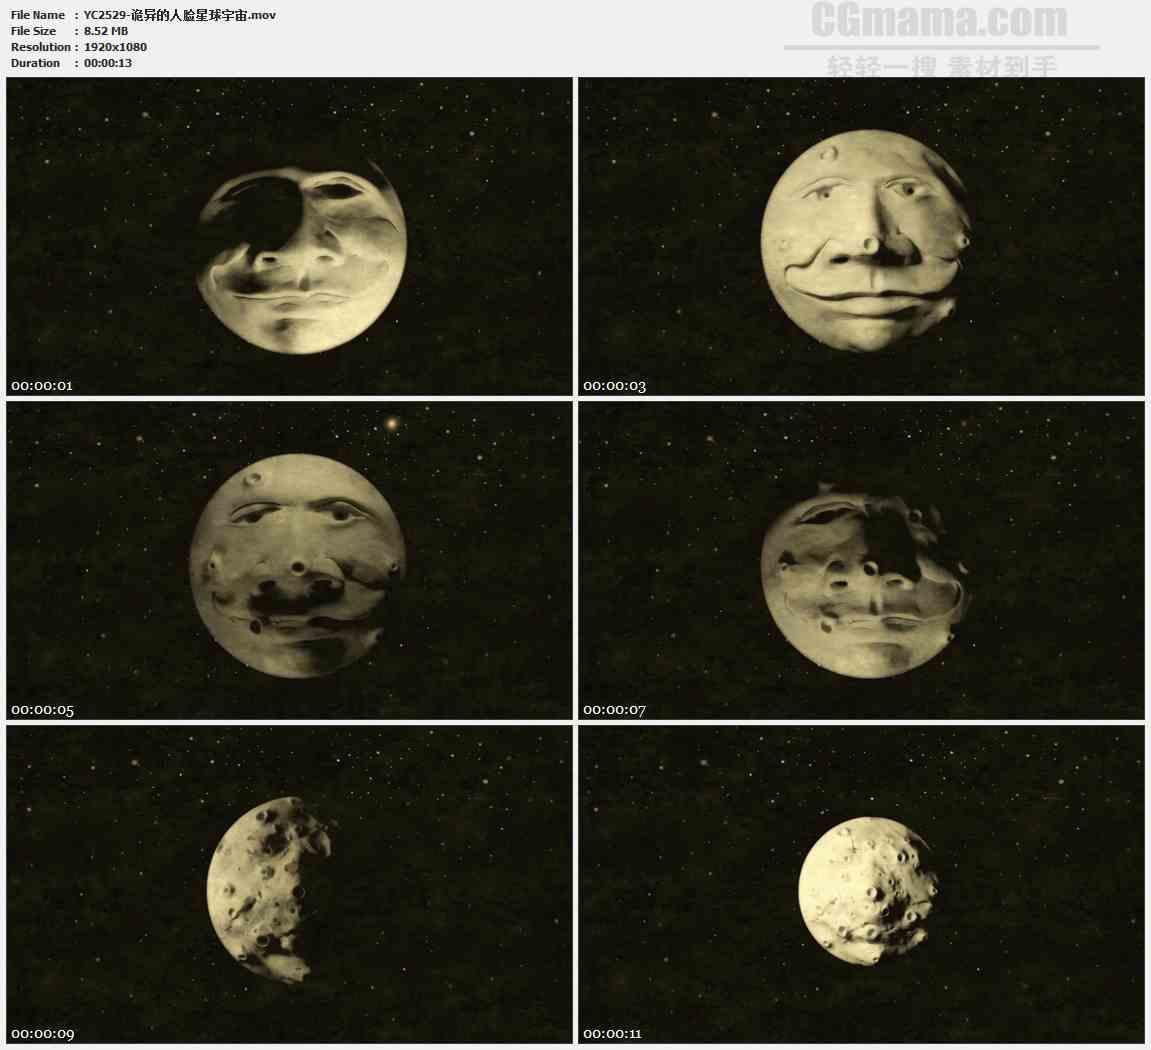 YC2529-诡异的人脸星球宇宙高清视频素材